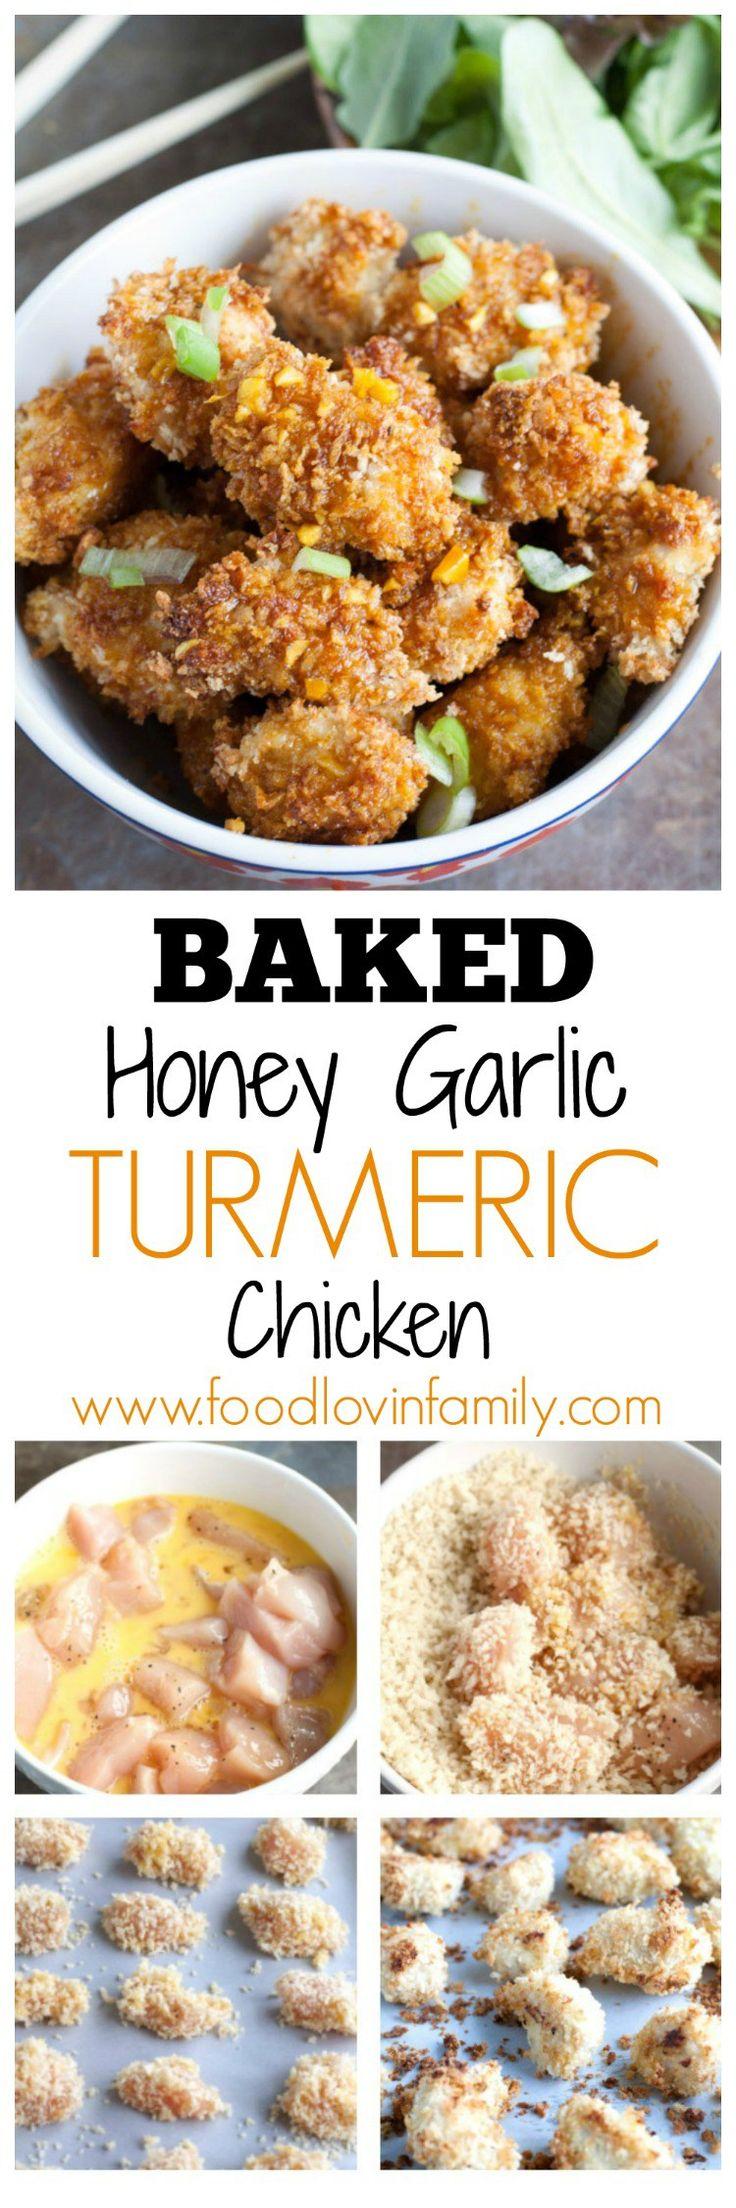 Baked honey garlic turmeric chicken packs a lot of flavor into crispy chicken bites.